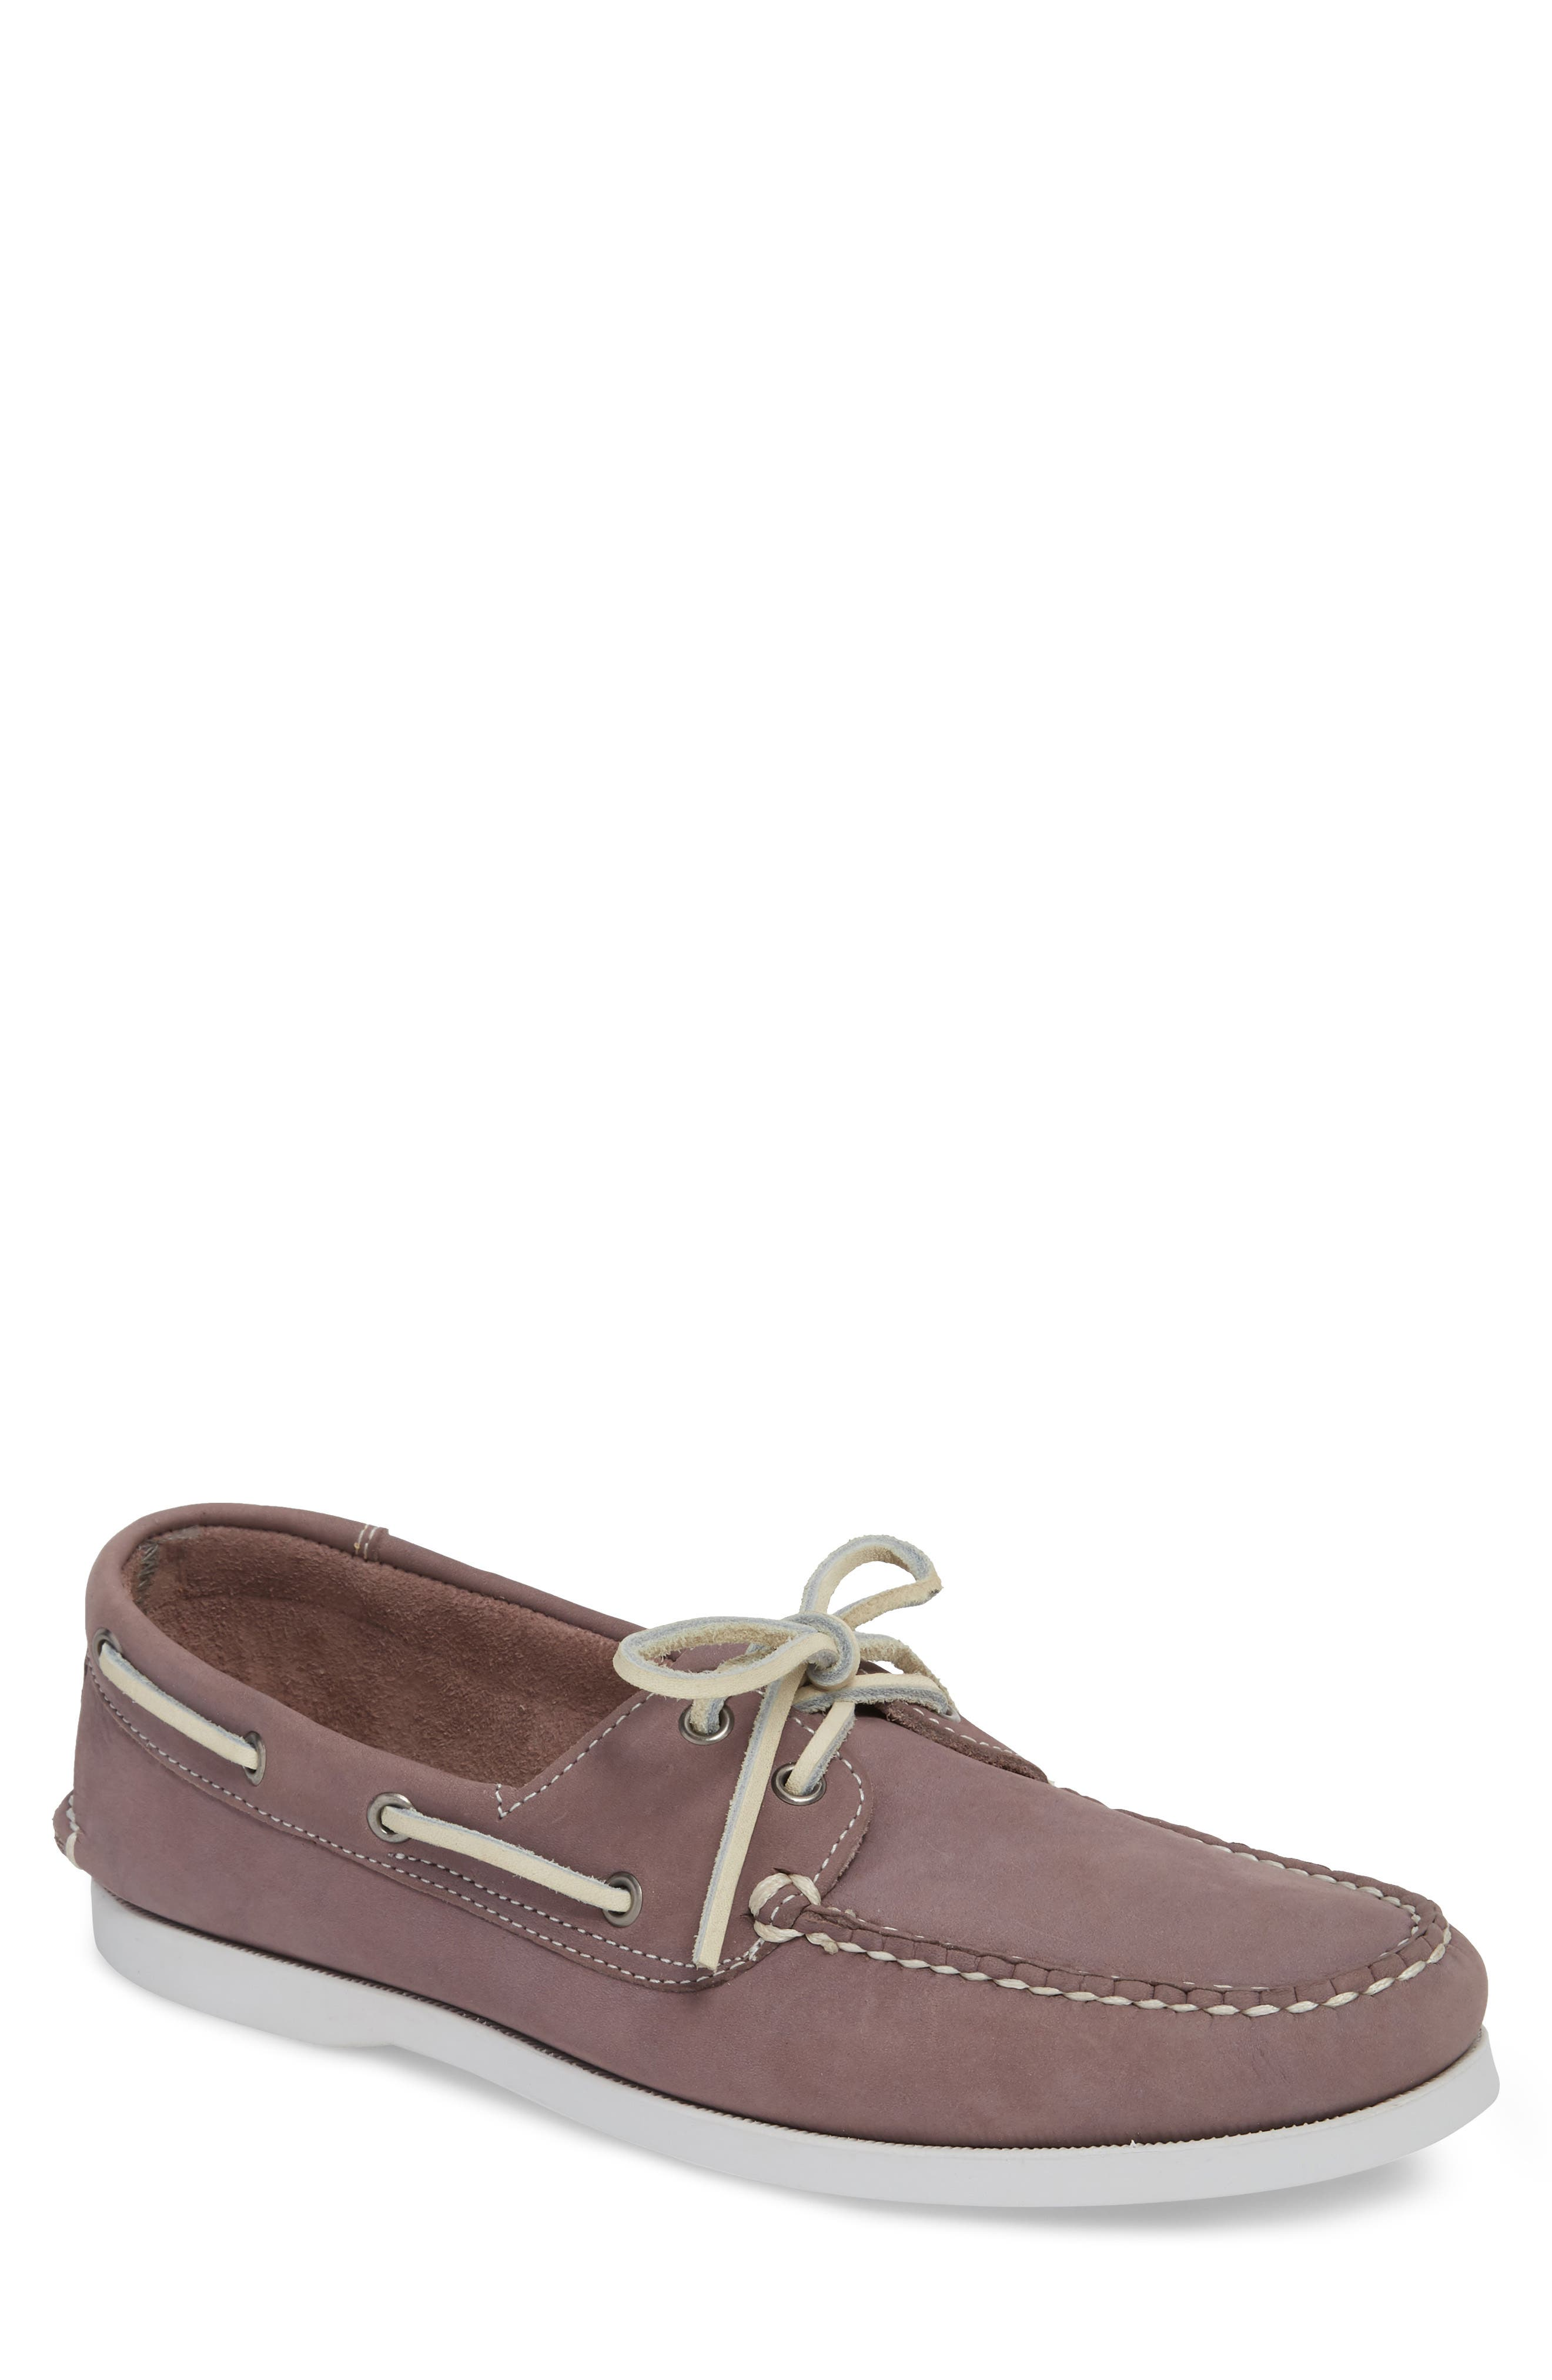 Pacific Boat Shoe,                         Main,                         color, Lavender Nubuck